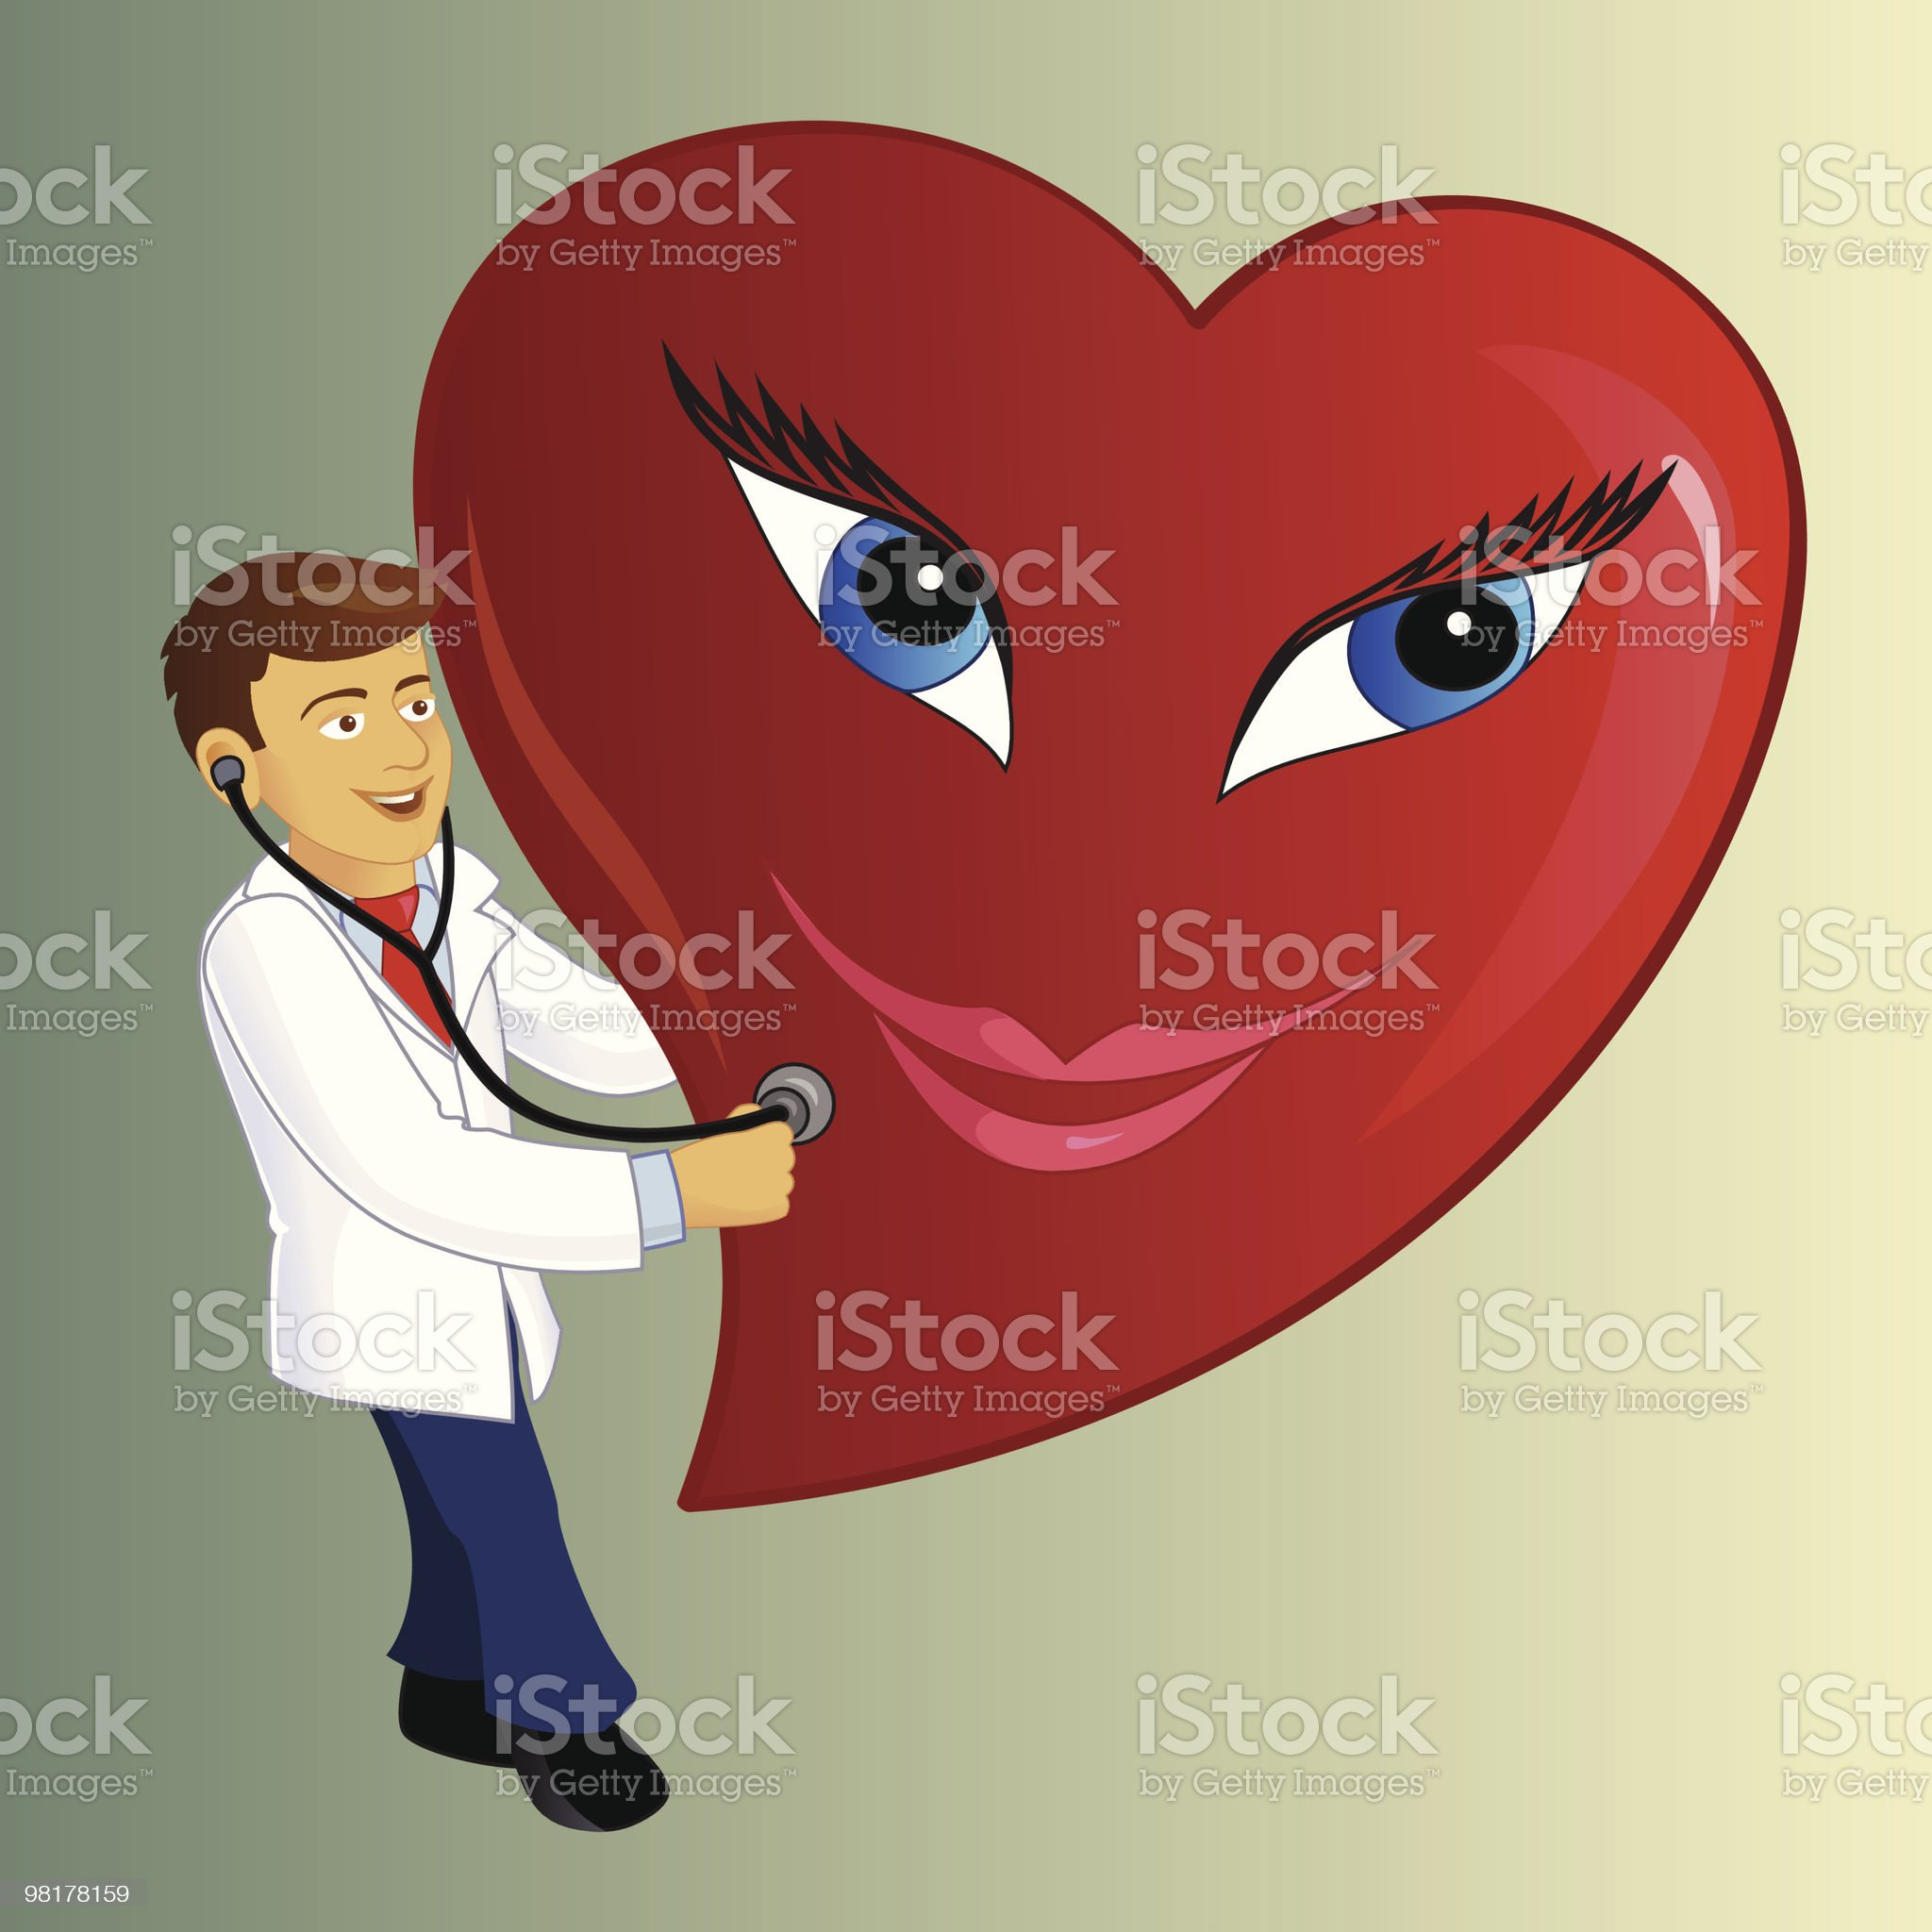 Heart Doctor royalty-free stock vector art